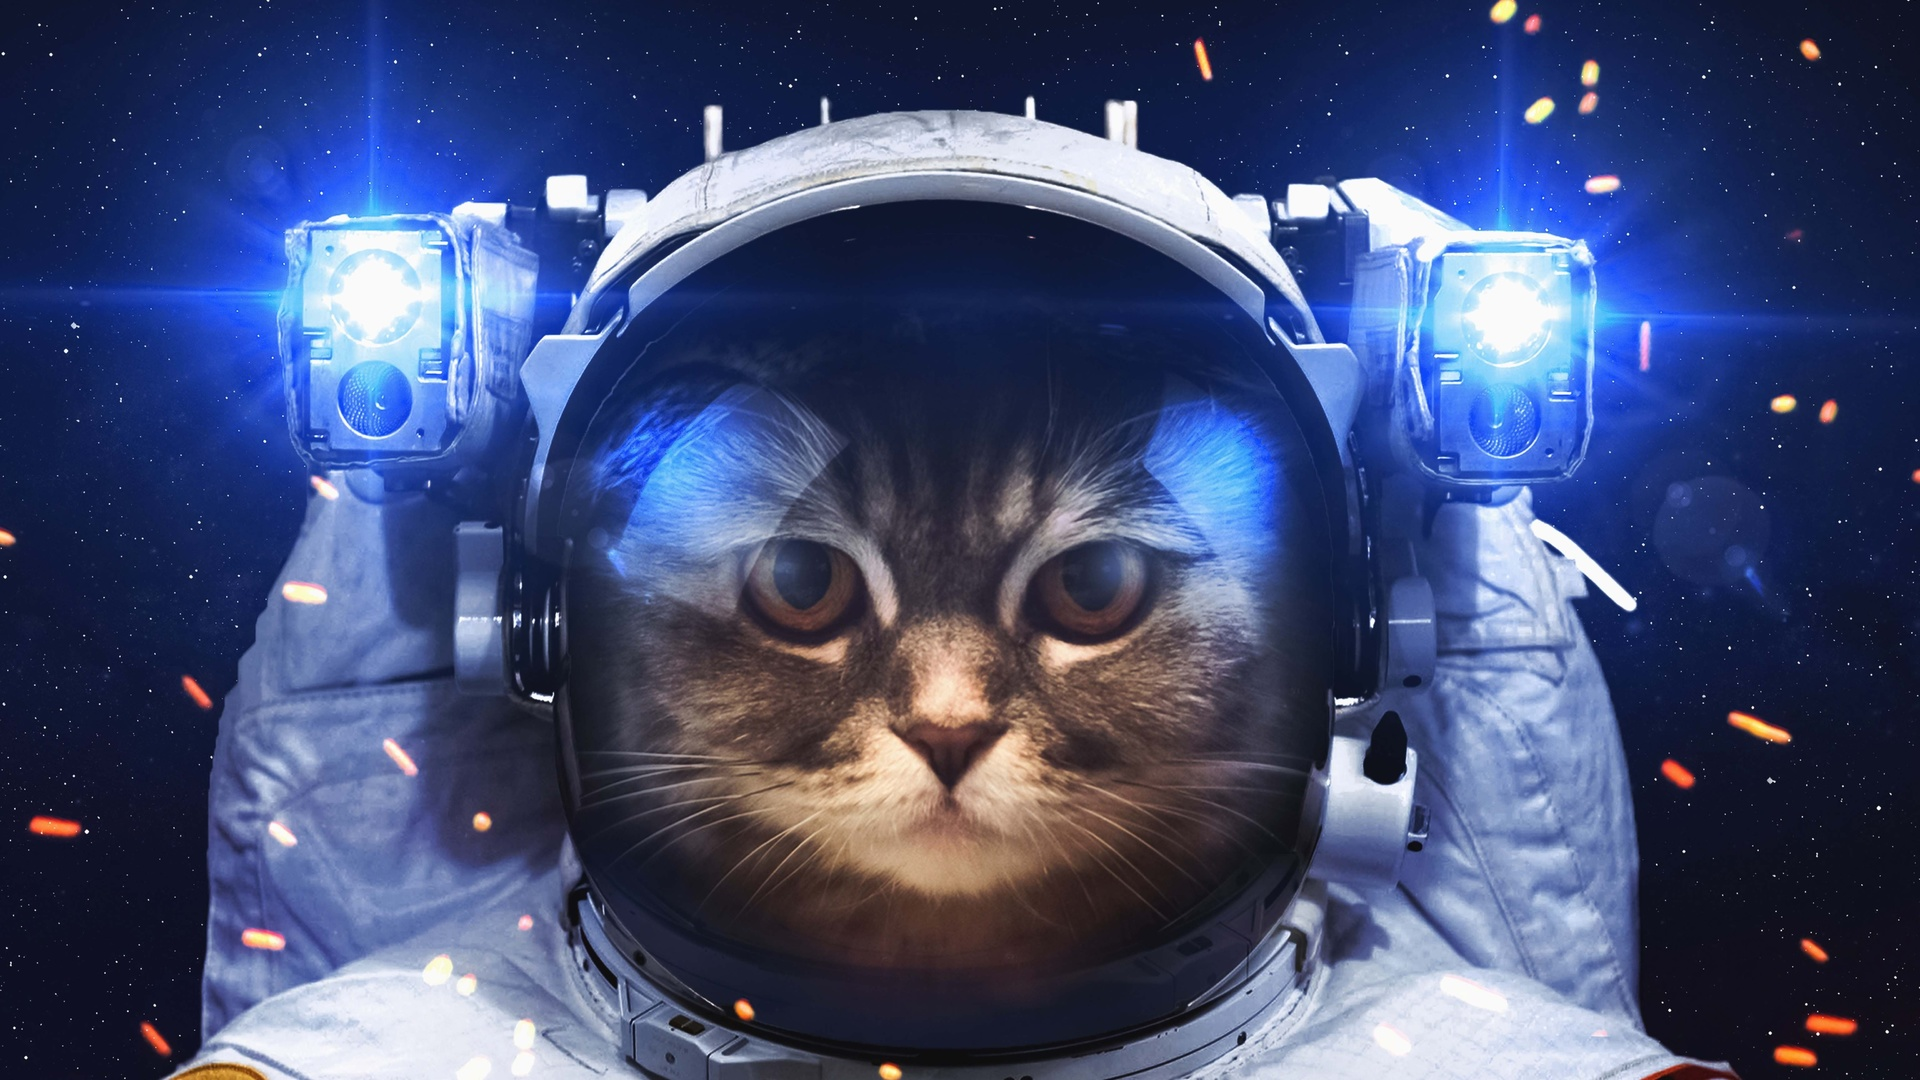 кот, космонавт, фэнтези, работа